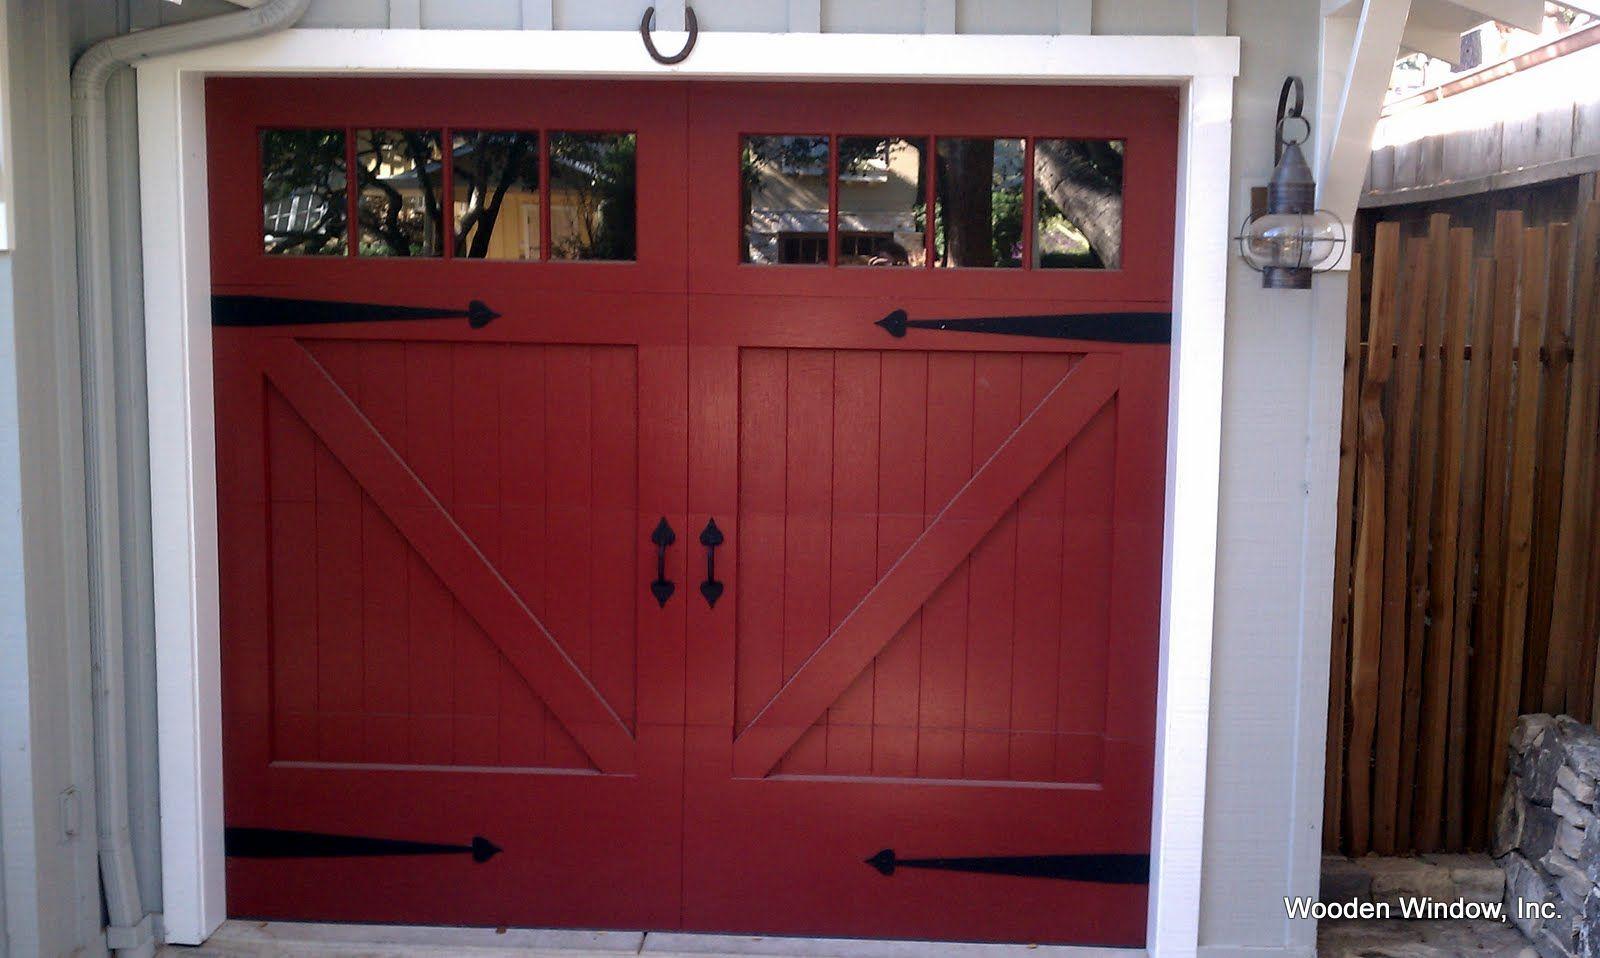 Garage door windows that open  Like detail color and style of door  Mountain Home ideas